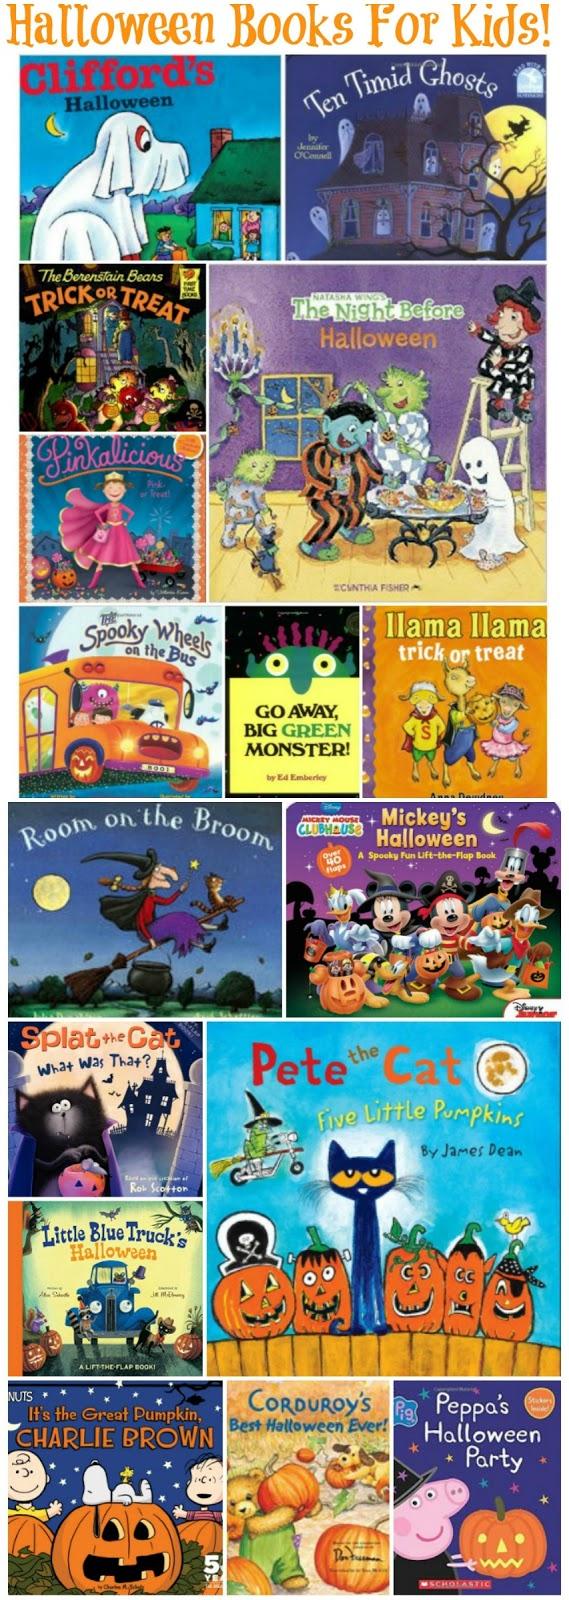 Halloween Books for Kids, Kids Halloween Books, Halloween Books, Halloween books for toddlers